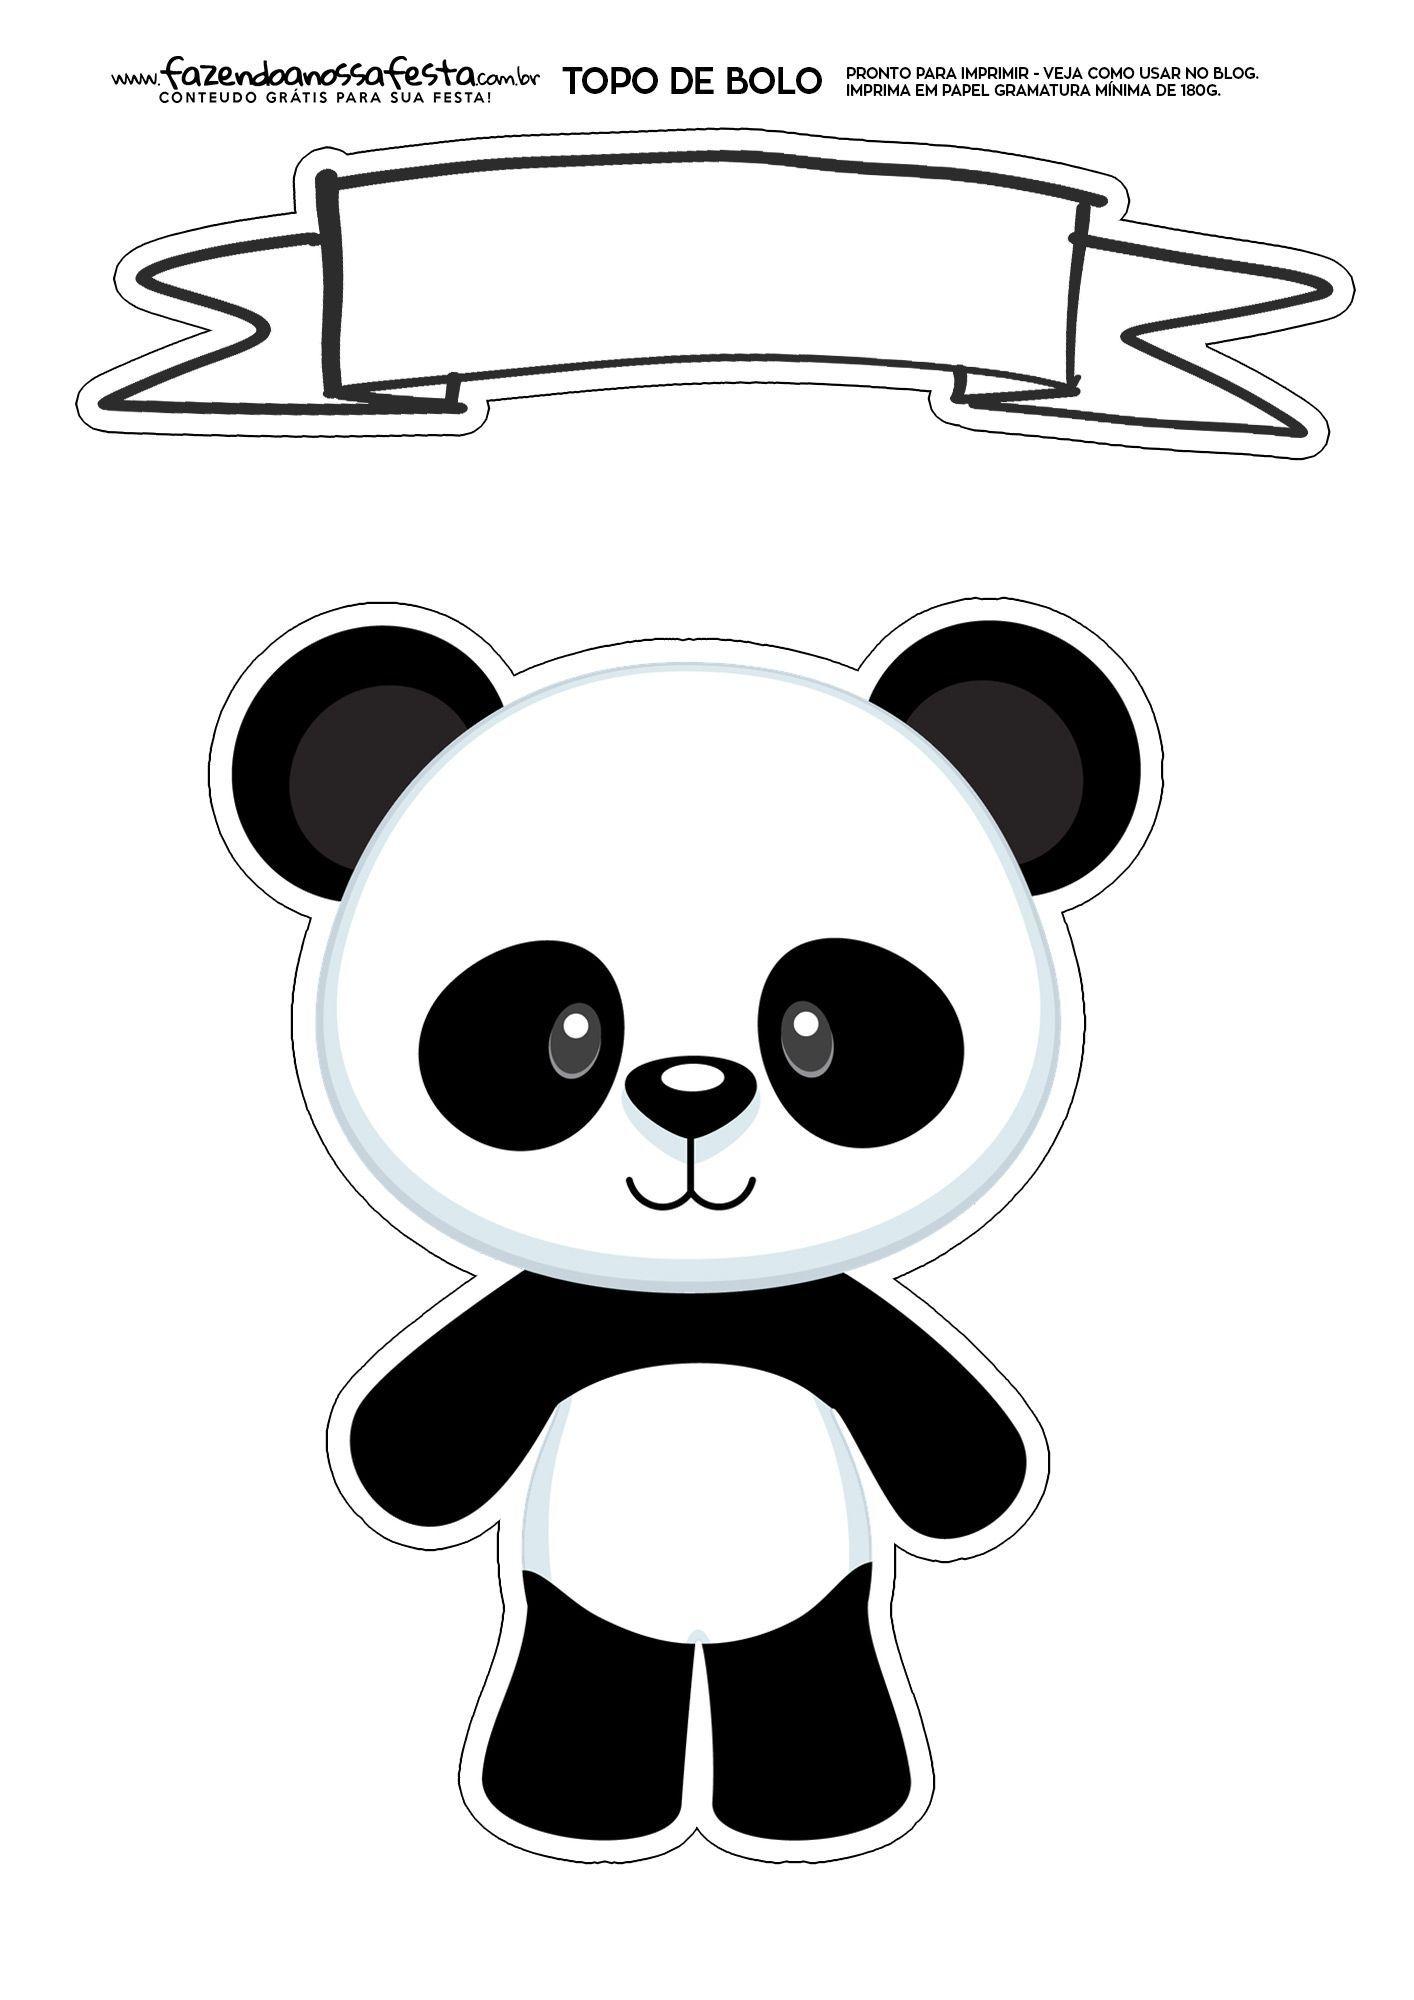 Great Fun Perfect Gift Love Panda T Shirt Do You Know A Girl Who Loves A Panda Or Panda Bears Then This Aw Panda Wallpapers Cute Panda Drawing Panda Birthday